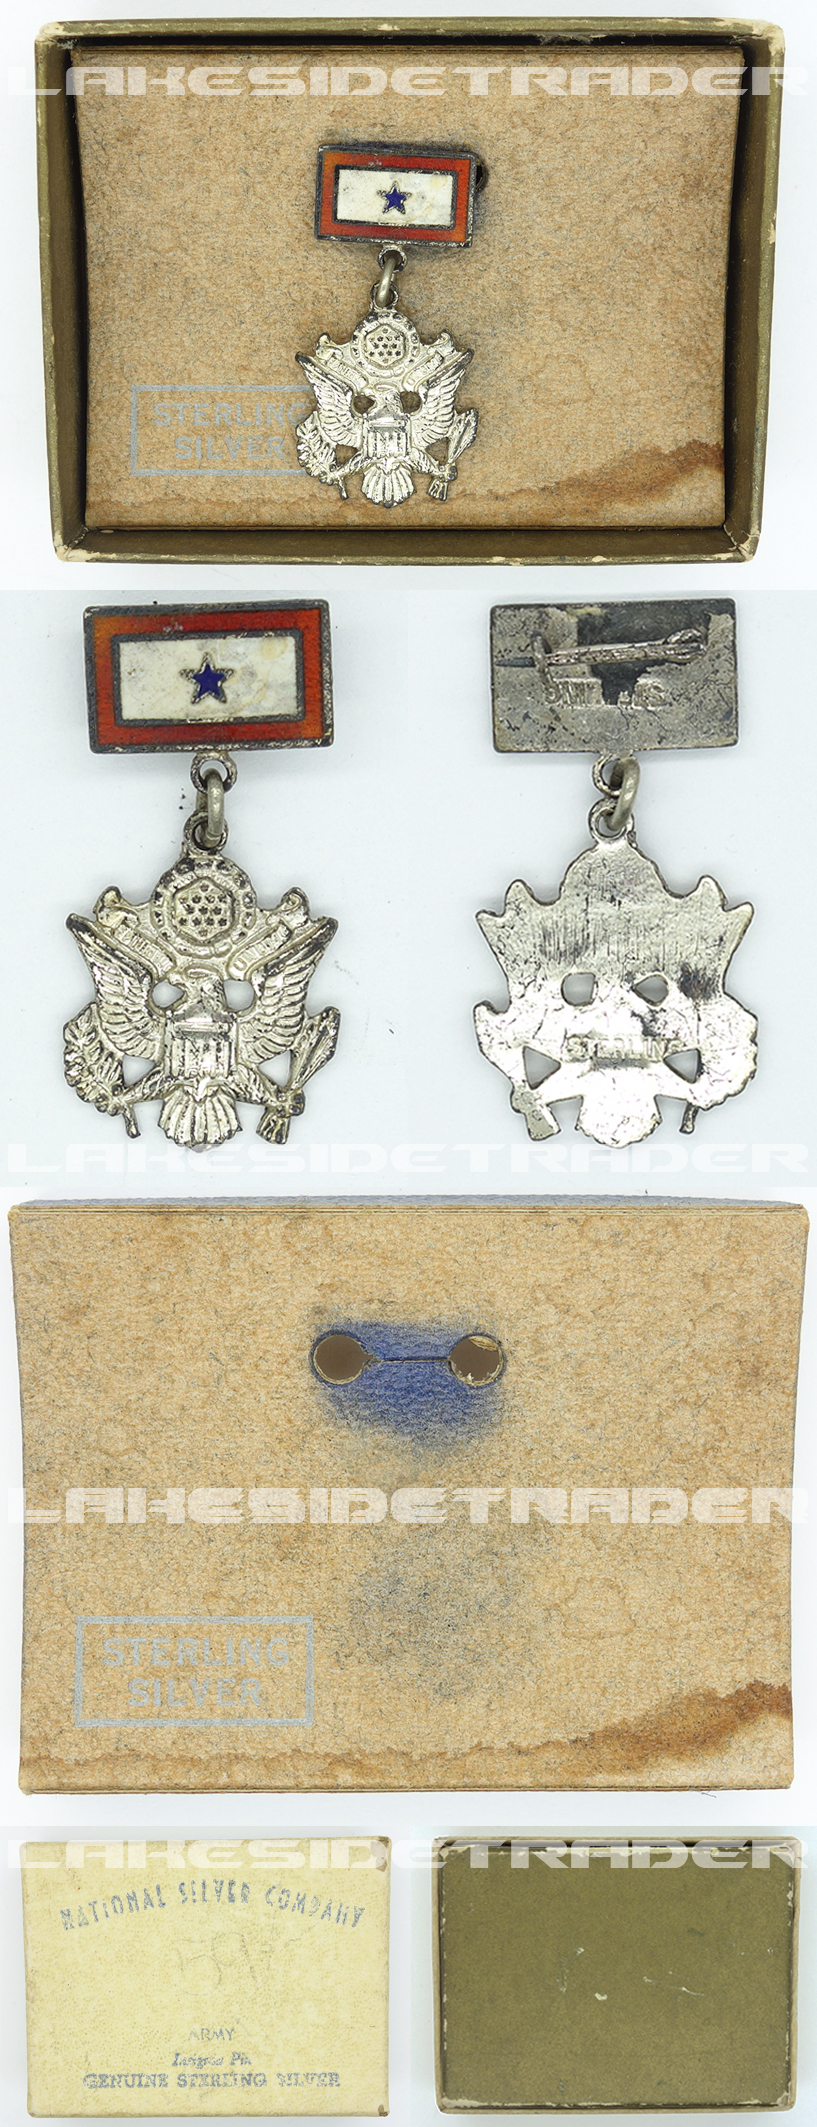 Cased U.S. Army Insignia Pin